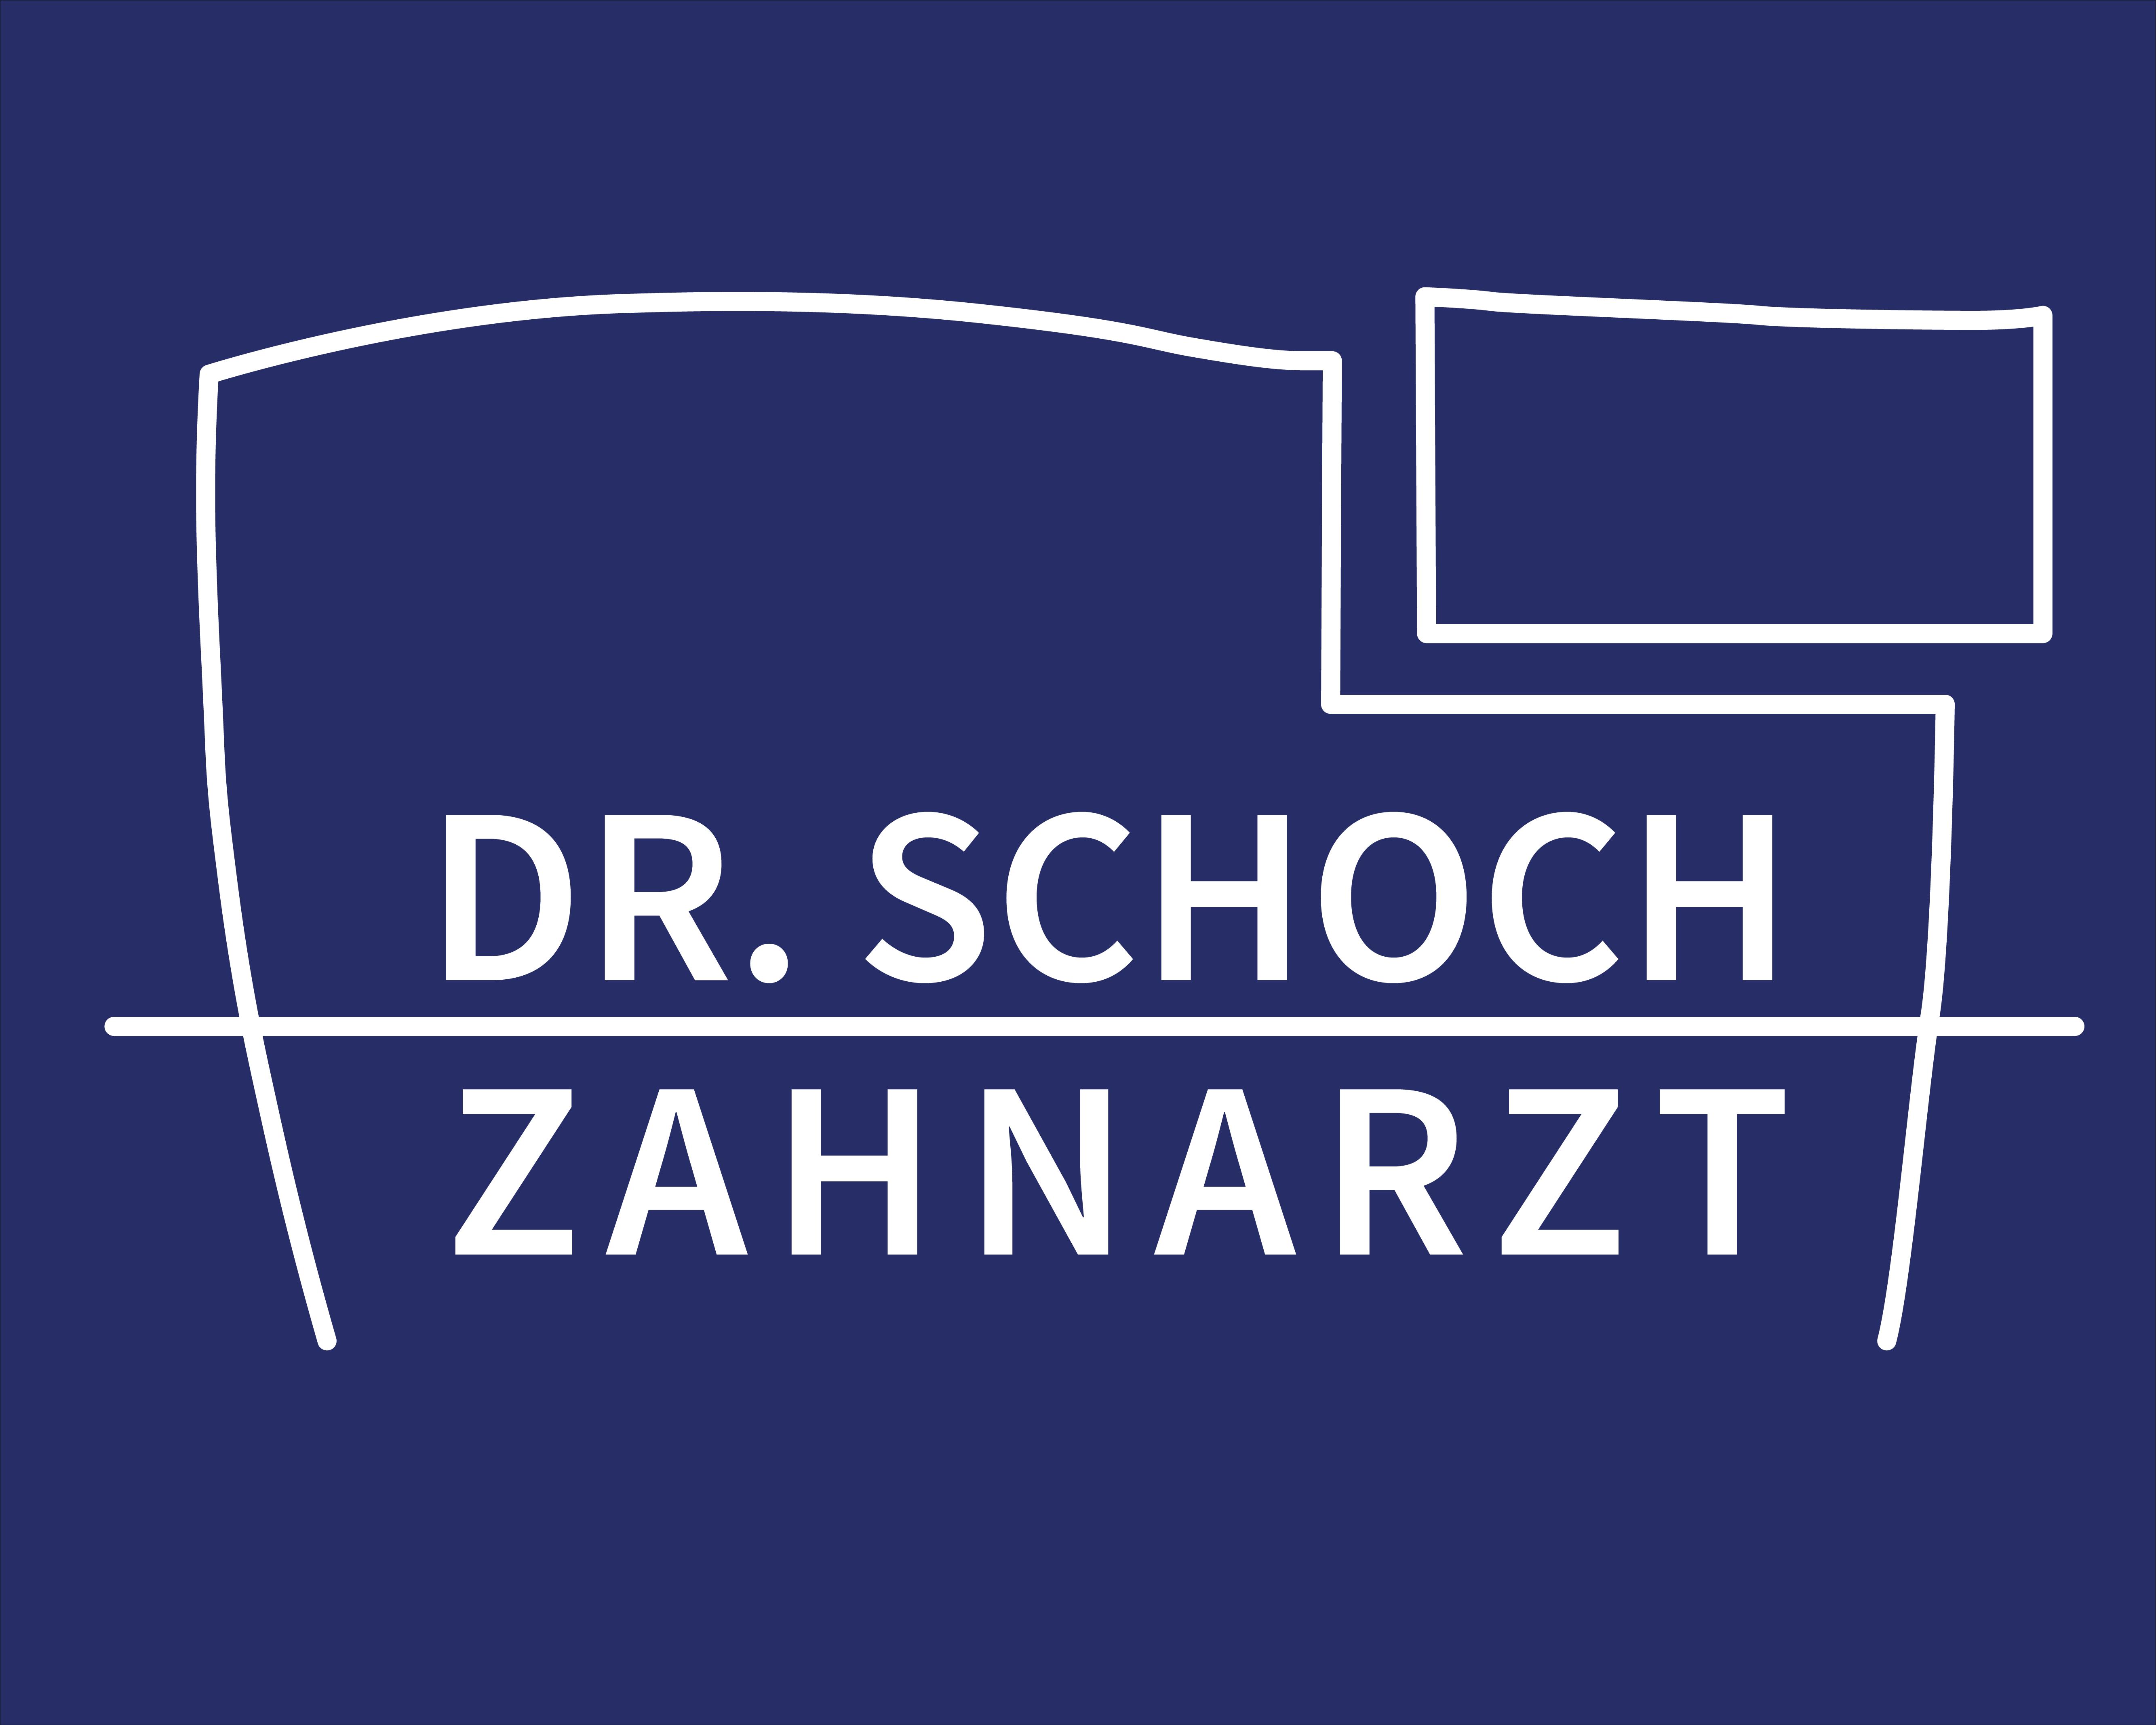 Zahnarztpraxis Dr. Schoch